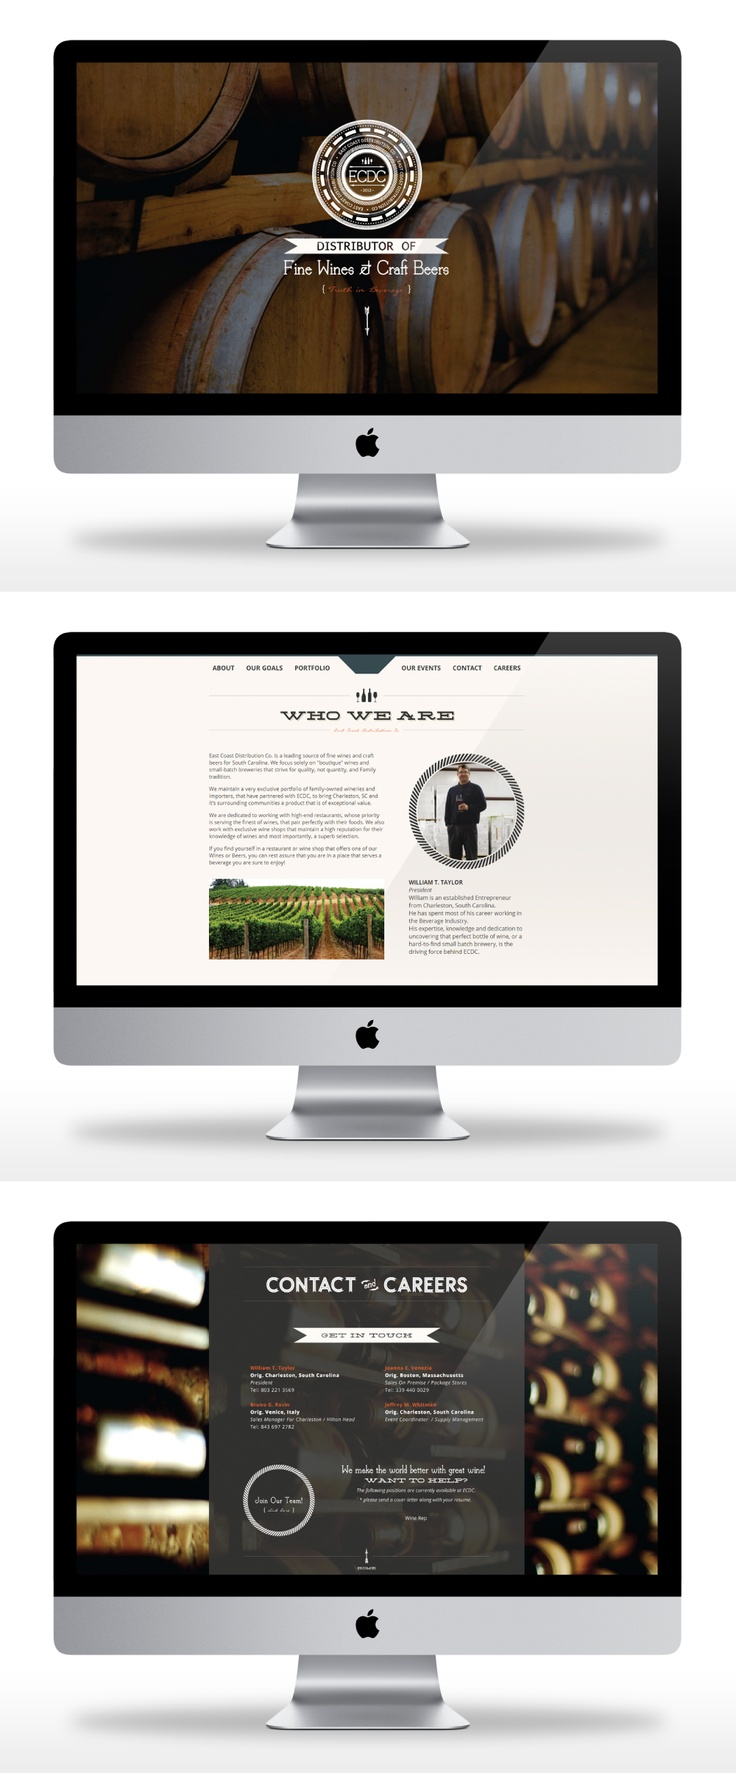 East Coast Distribution Co - DesAutels Designs | logo and website design & development | www.ecdcsc.com